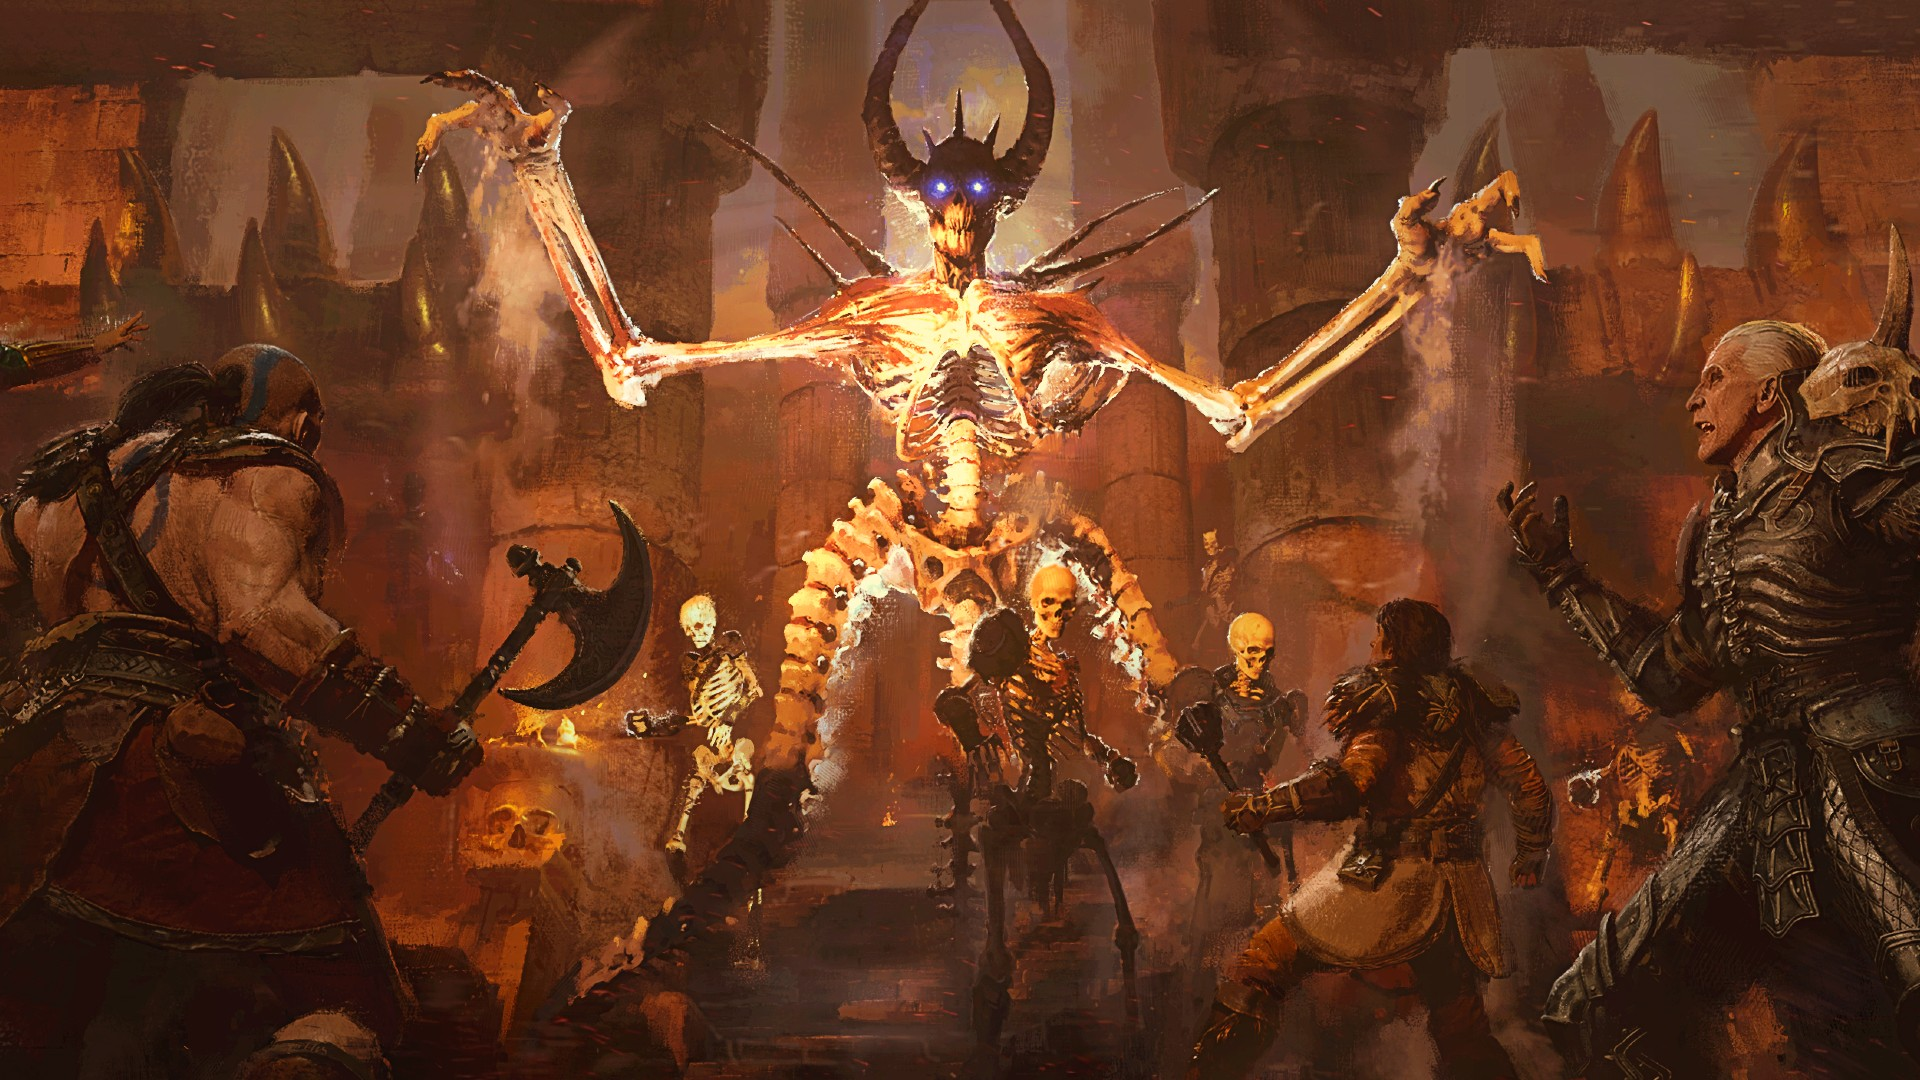 Diablo 2: Resurrected has mod support